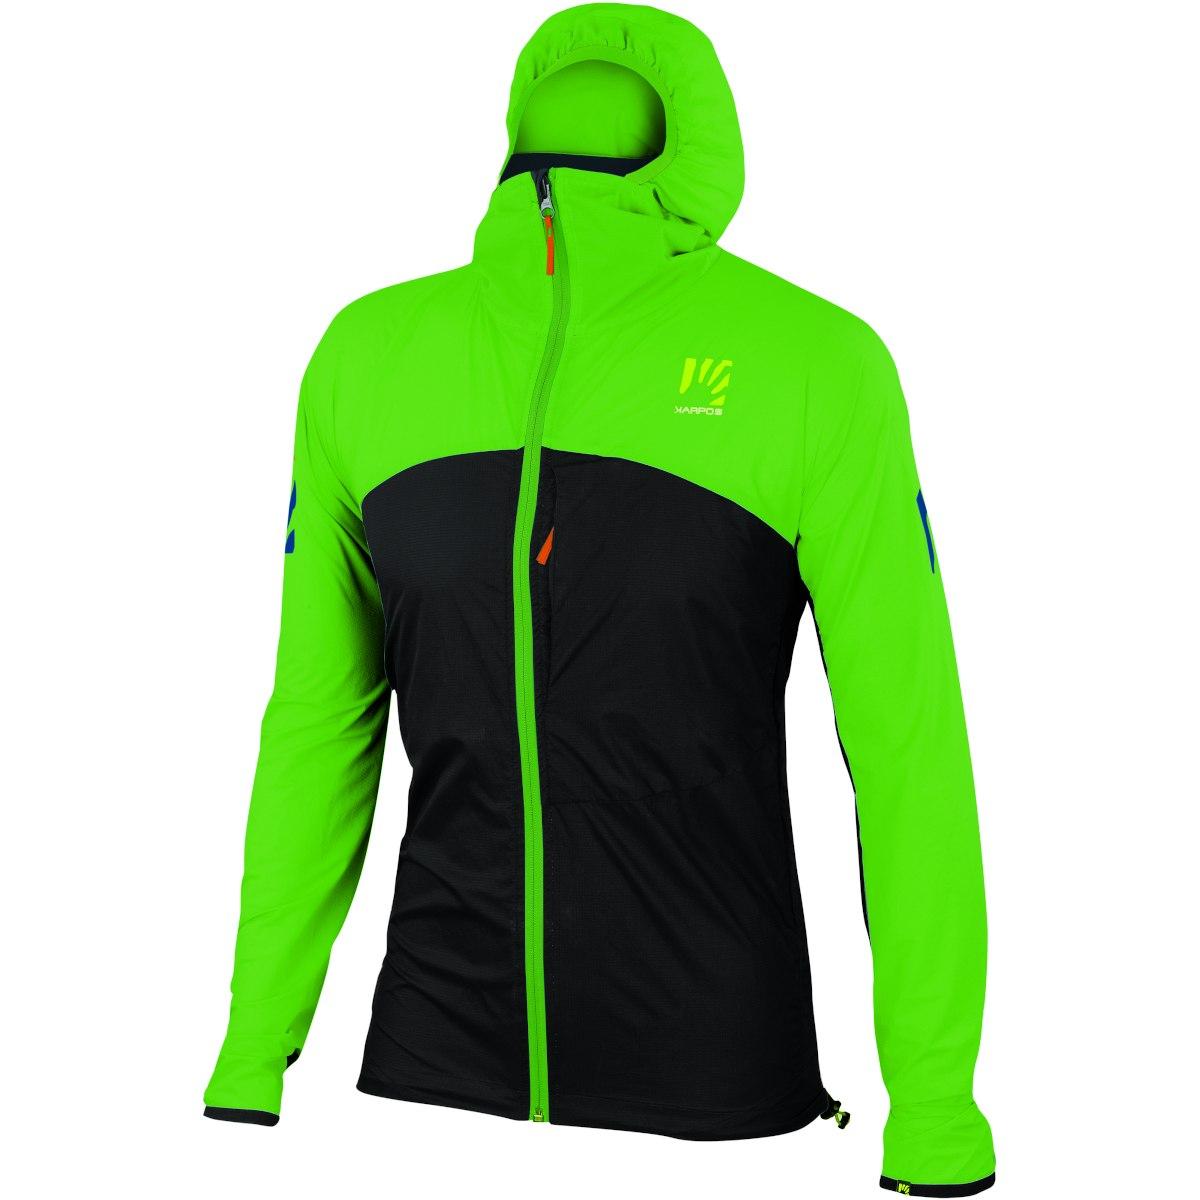 Image of Karpos Lot Jacket - apple green/black